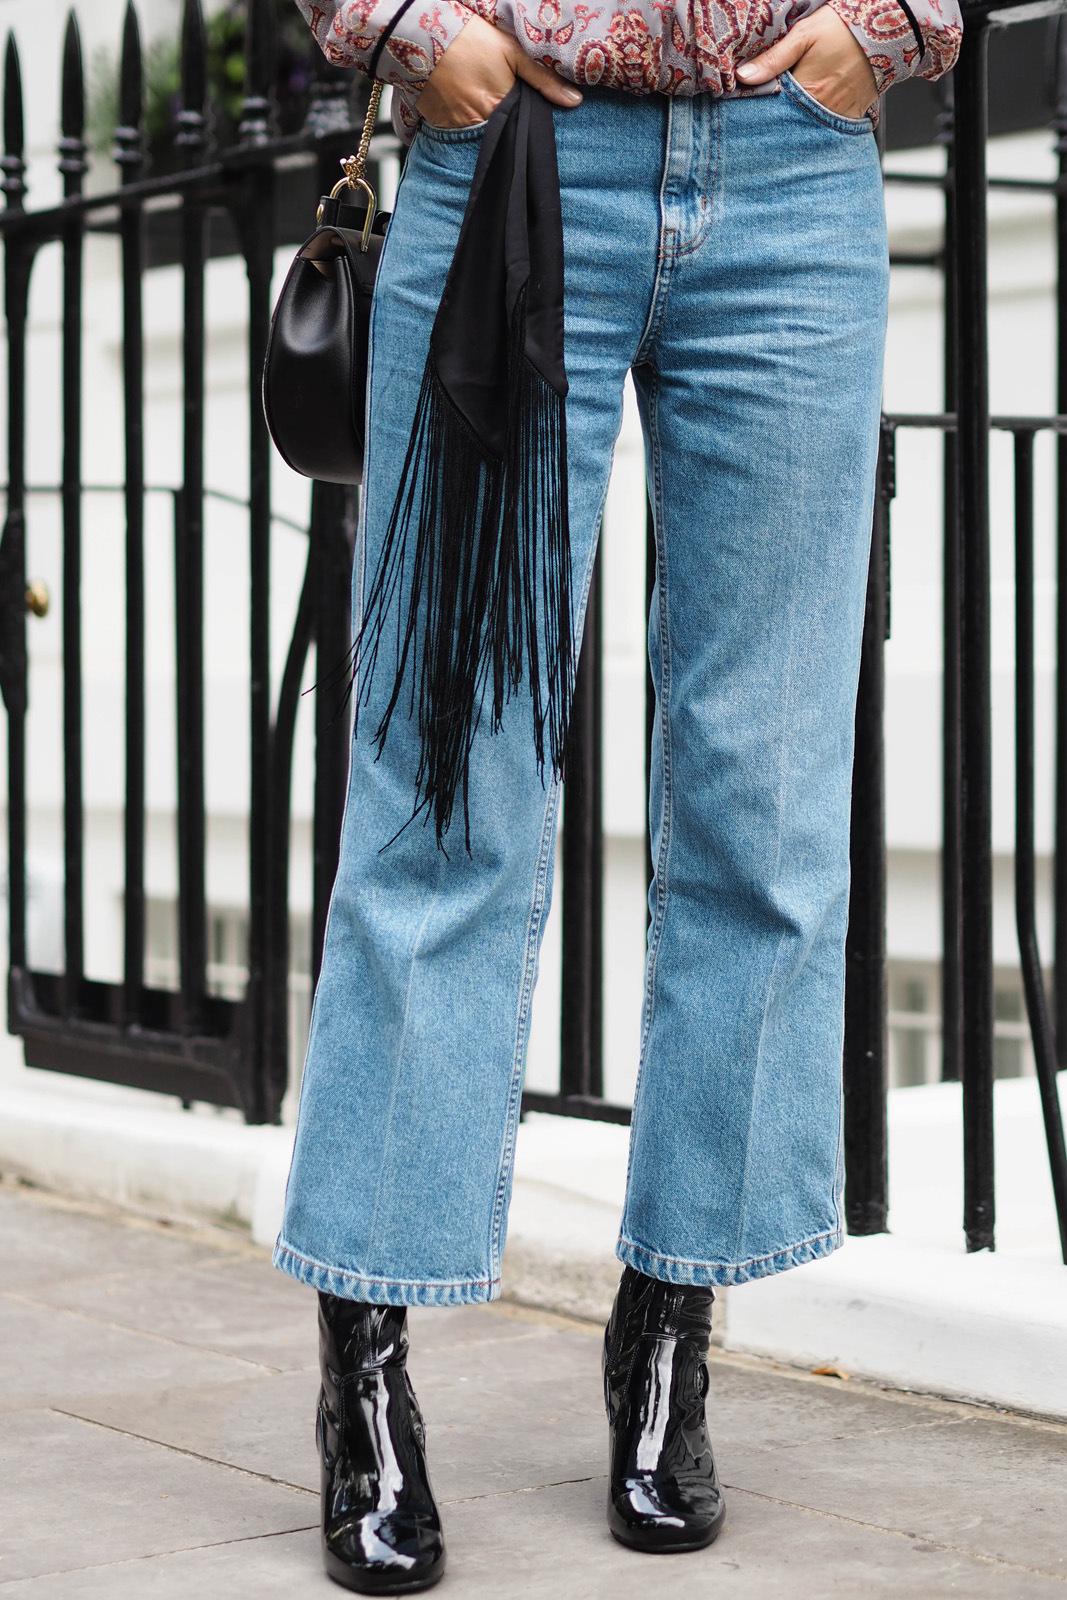 EJSTYLE-wears-wide-leg-cropped-Topshop-jeans-Black-patent-River-Island-block-heel-ankle-boots-skinny-fringe-scarf-belt